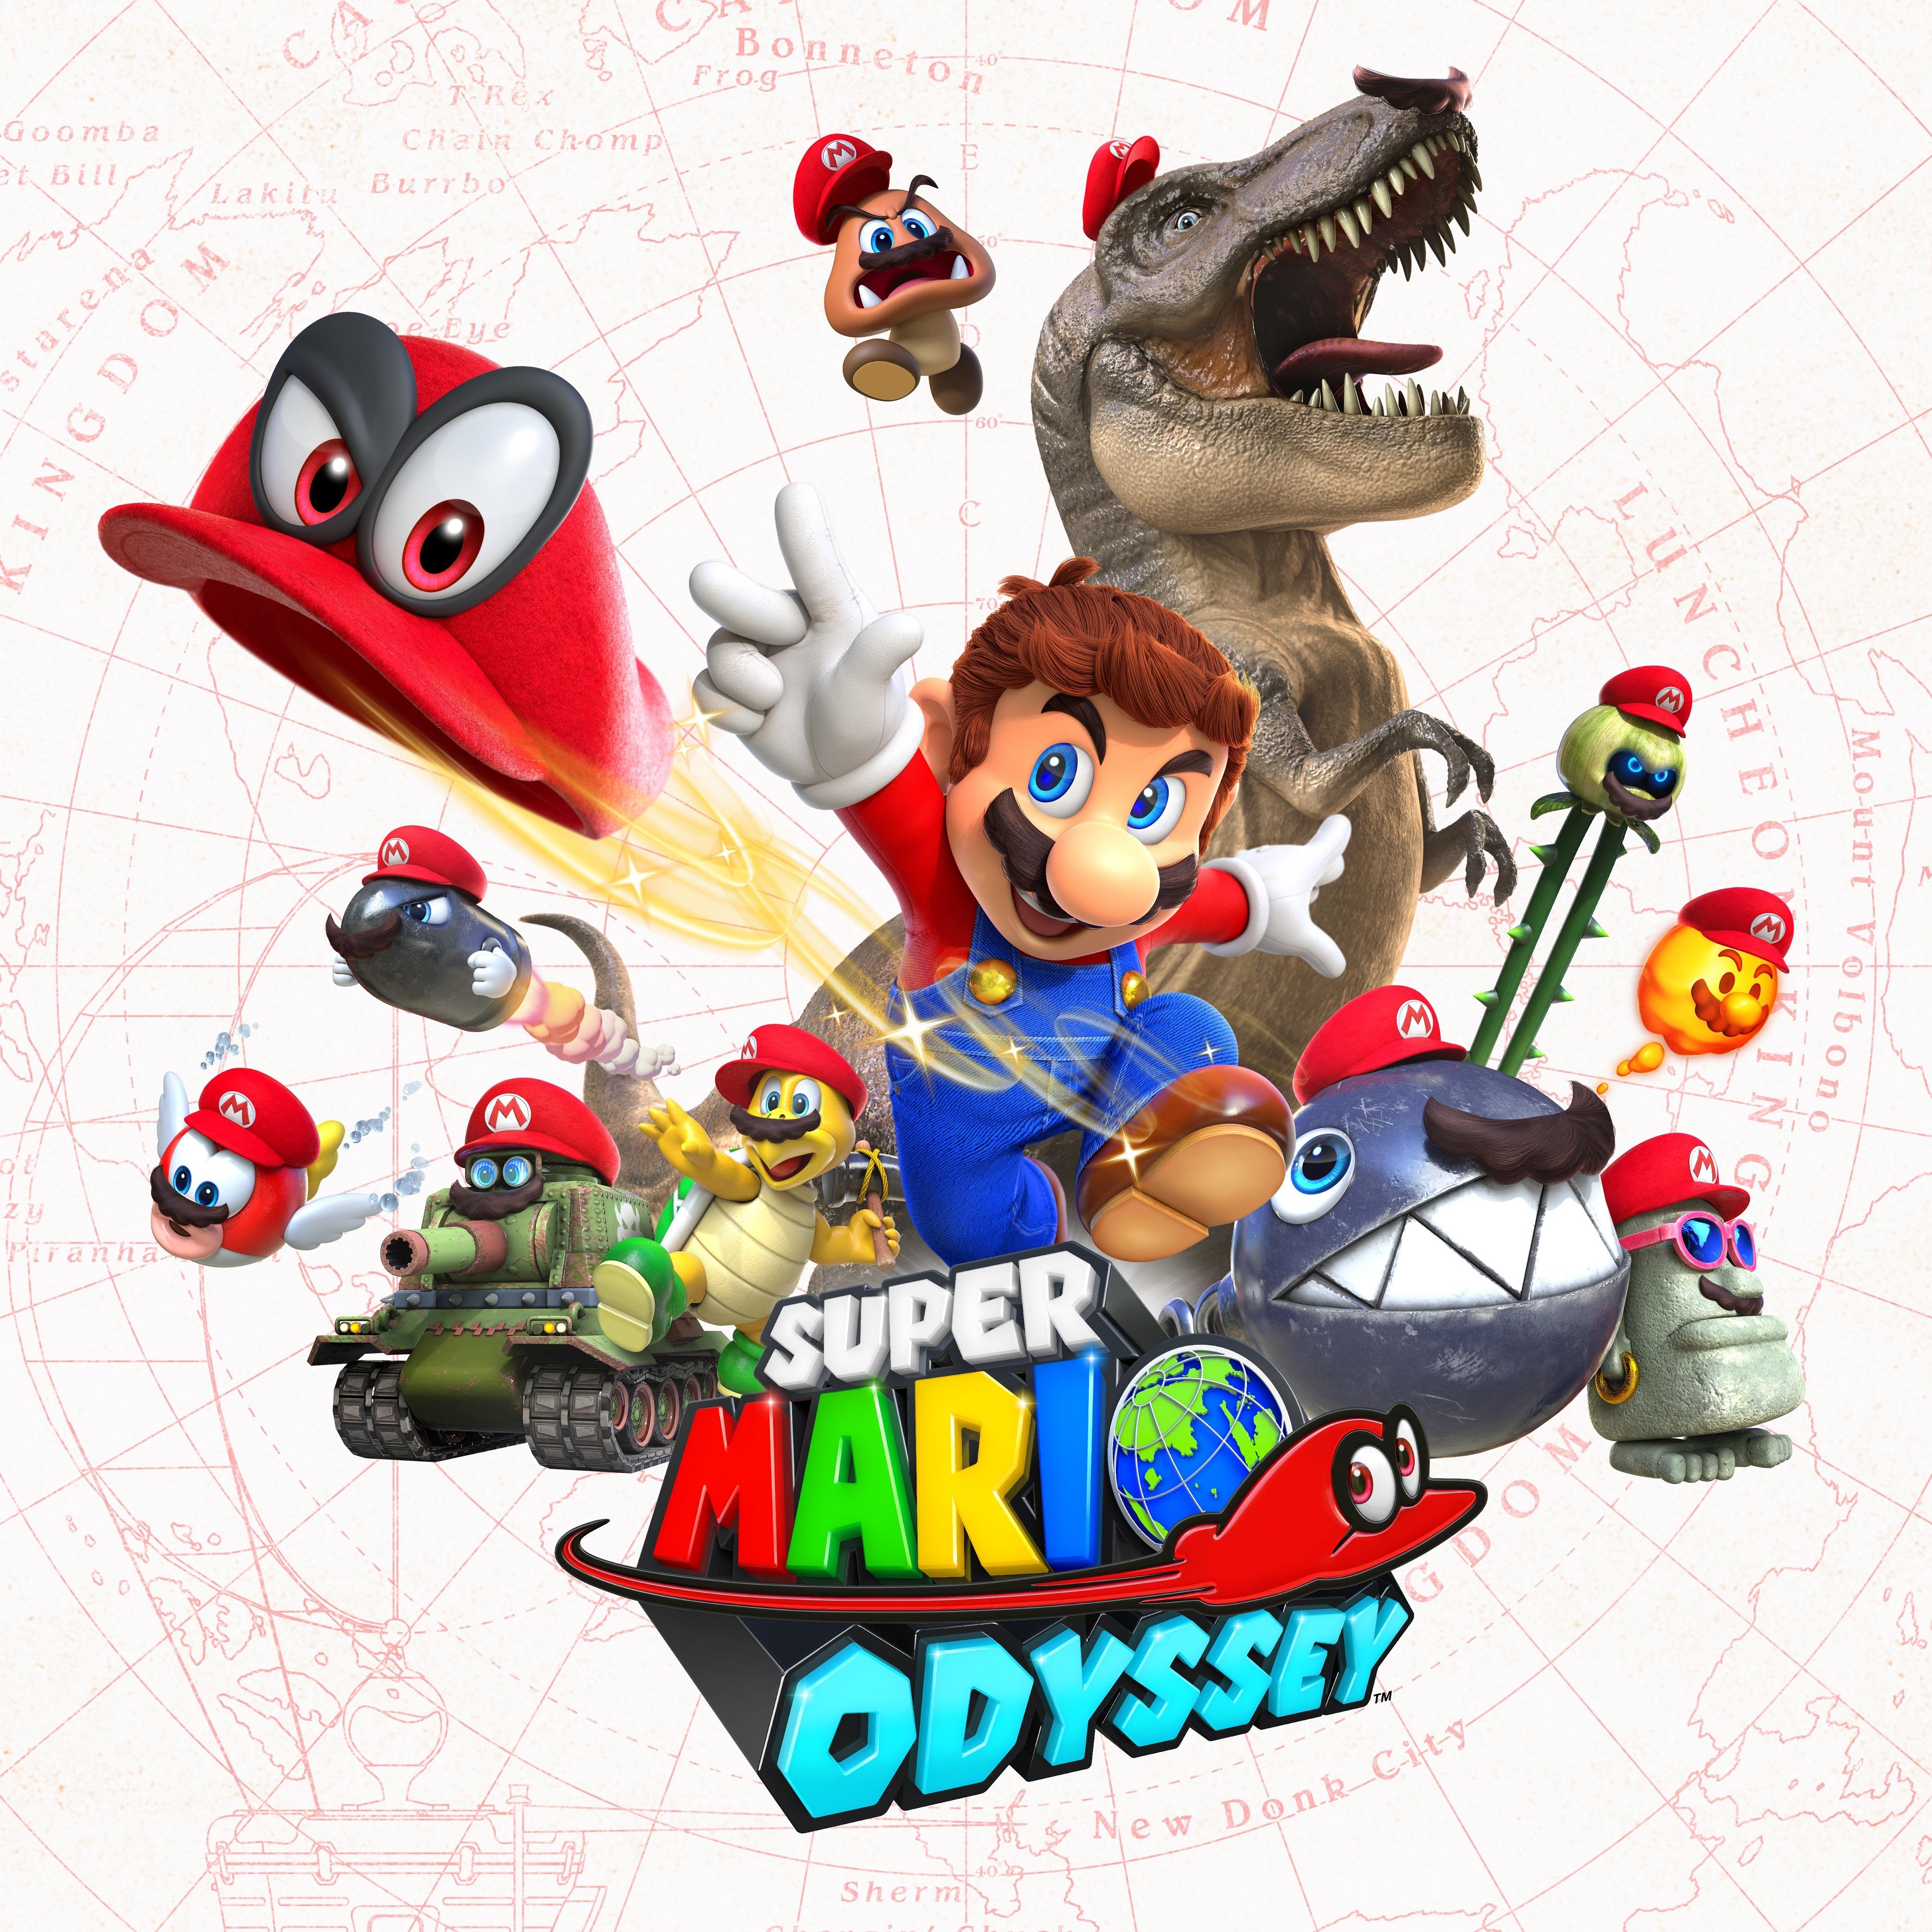 Super Mario Odyssey Becomes Nintendo's Fastest-Selling Super